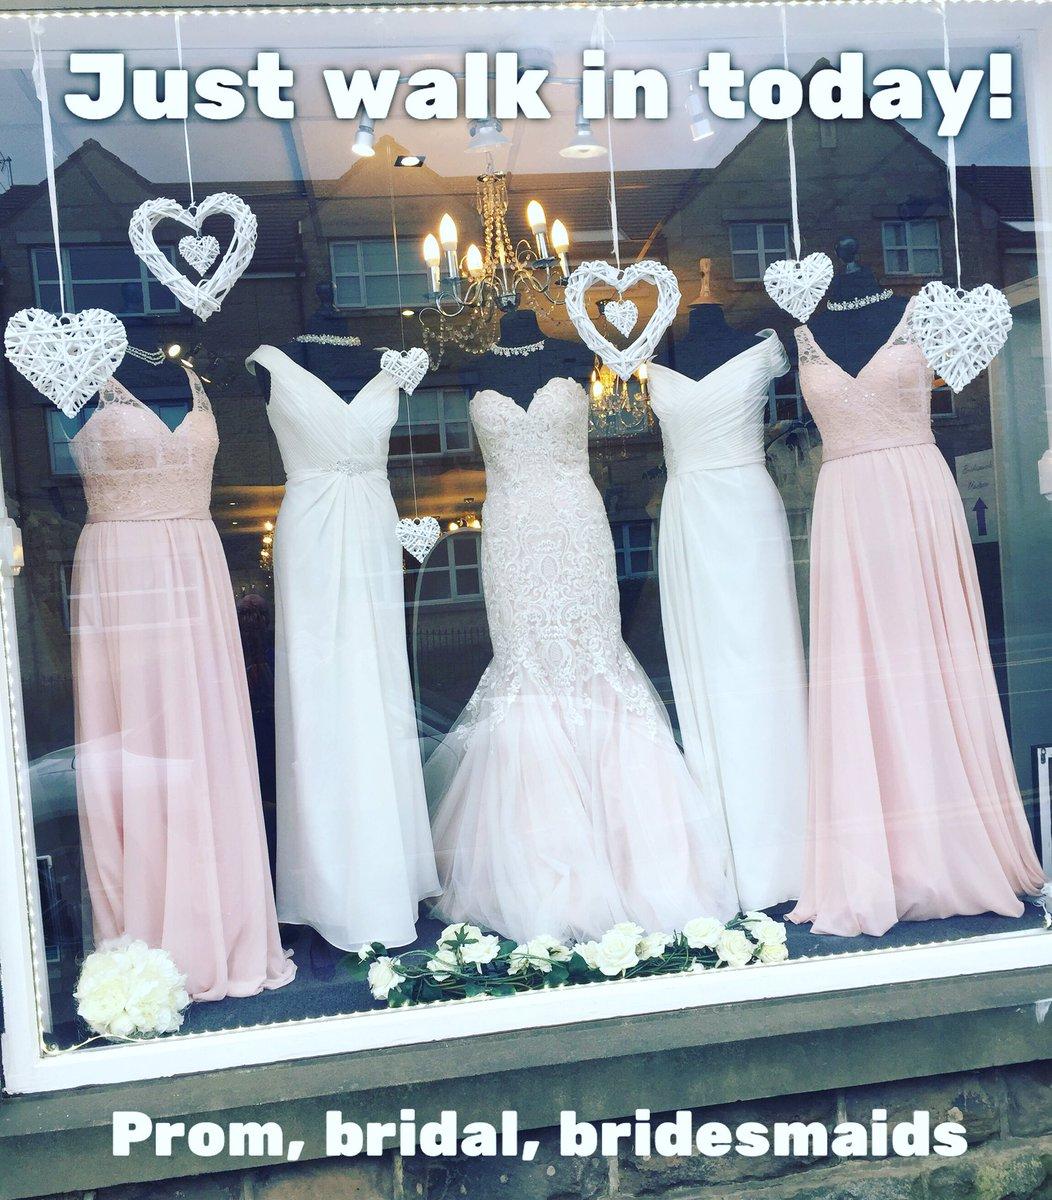 Prom Girls Bridetobe Bridesmaids Just Walk In This Afternoon Leeds Pudsey Weddingdress Wedding Yorkshire 0113 2360652 LS28 6ATpictwitter